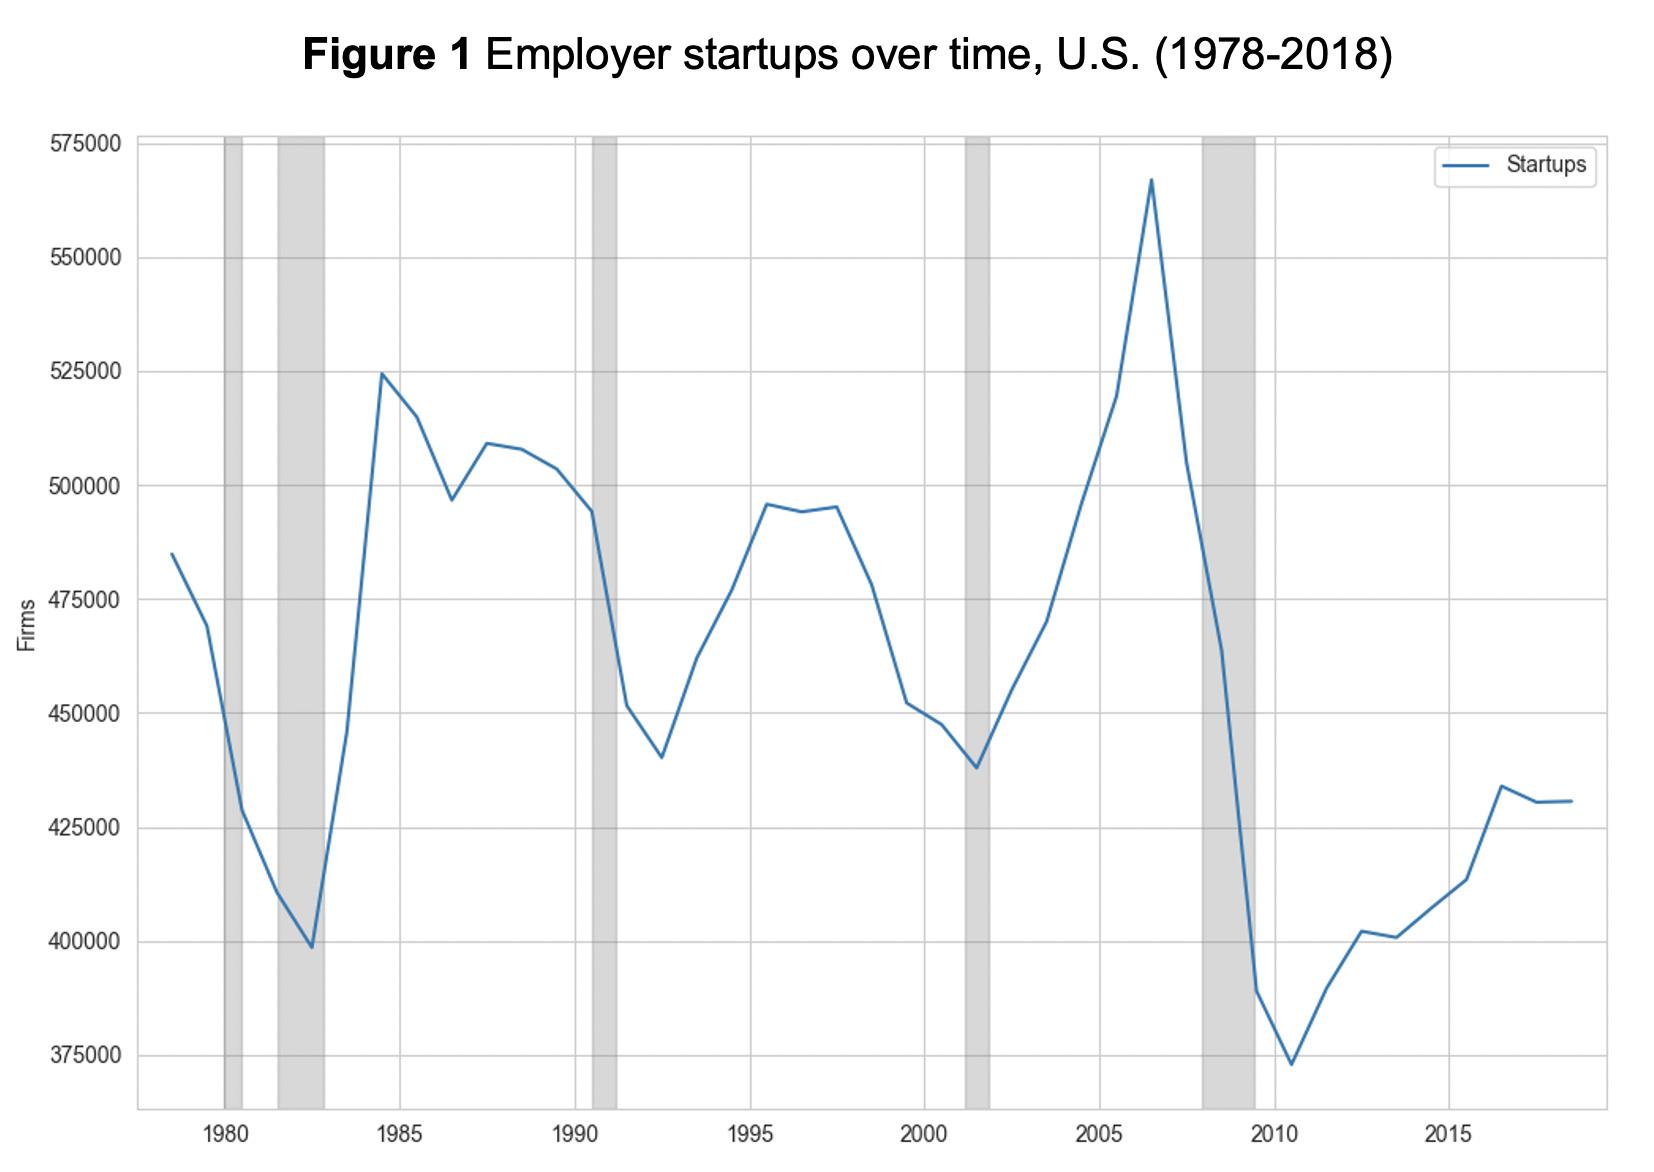 Figure 1: Employer startups over time, U.S. (1978-2018)